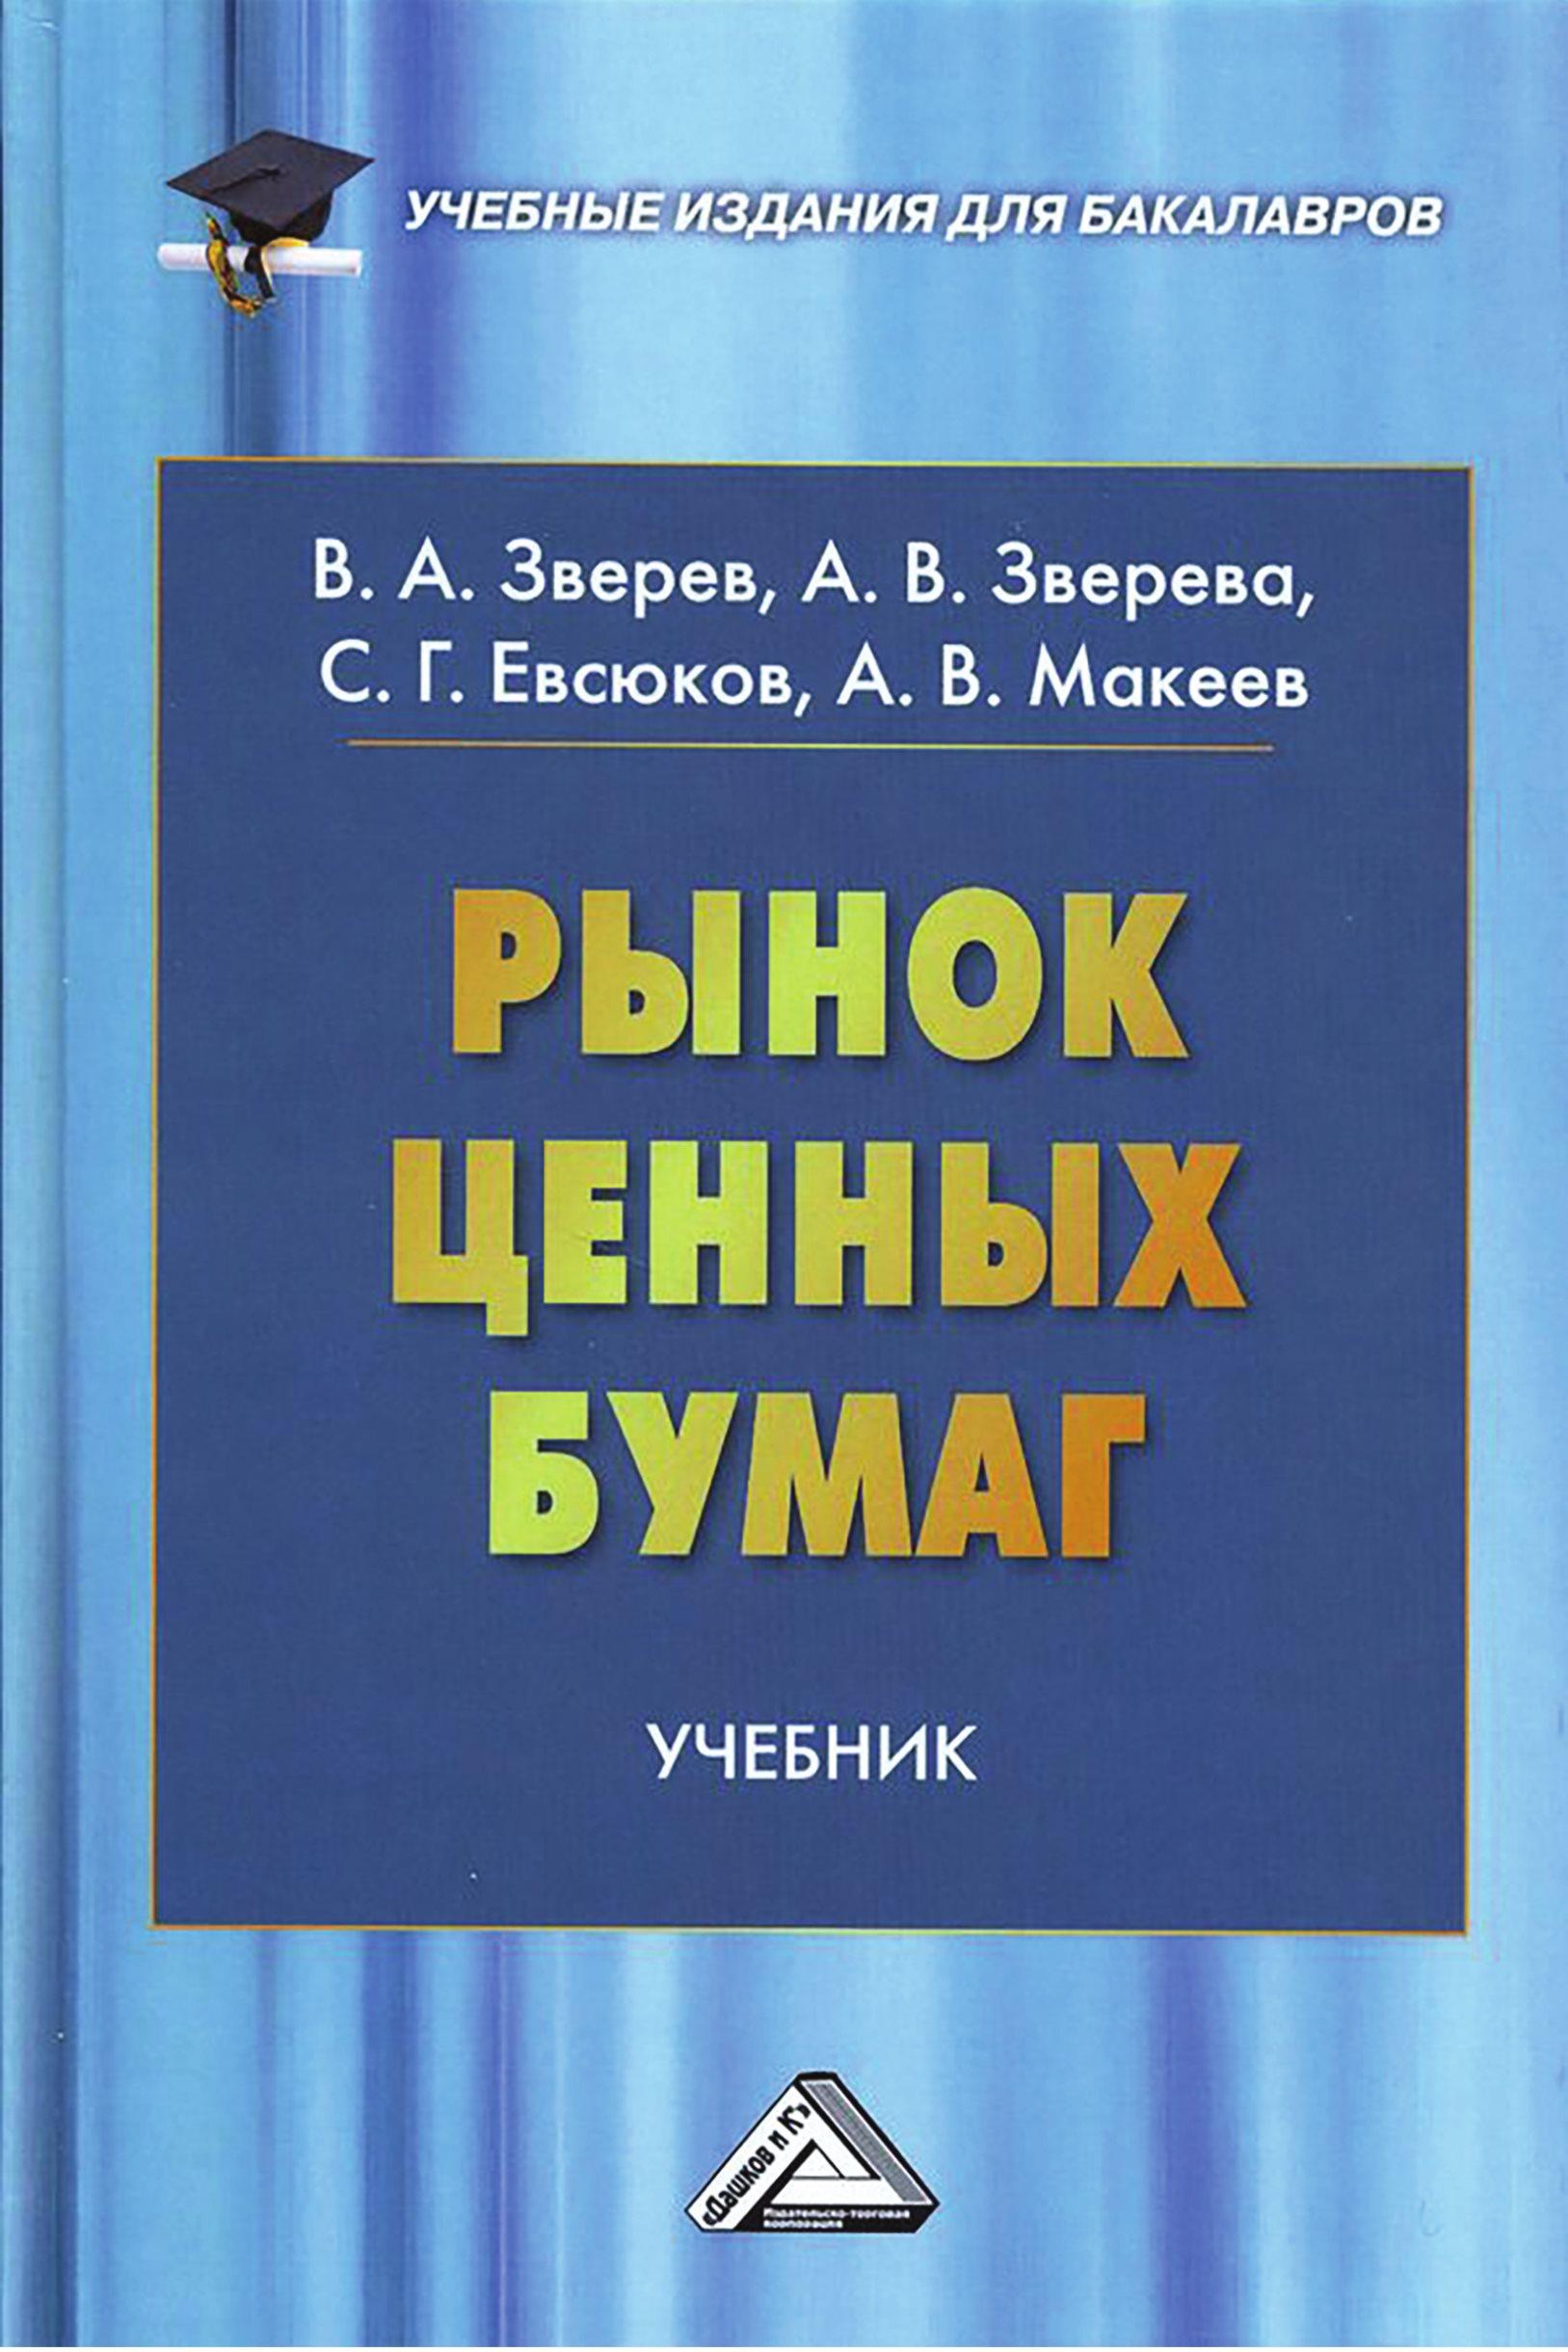 Александр Макеев Рынок ценных бумаг тимур леонидович самков рынок ценных бумаг